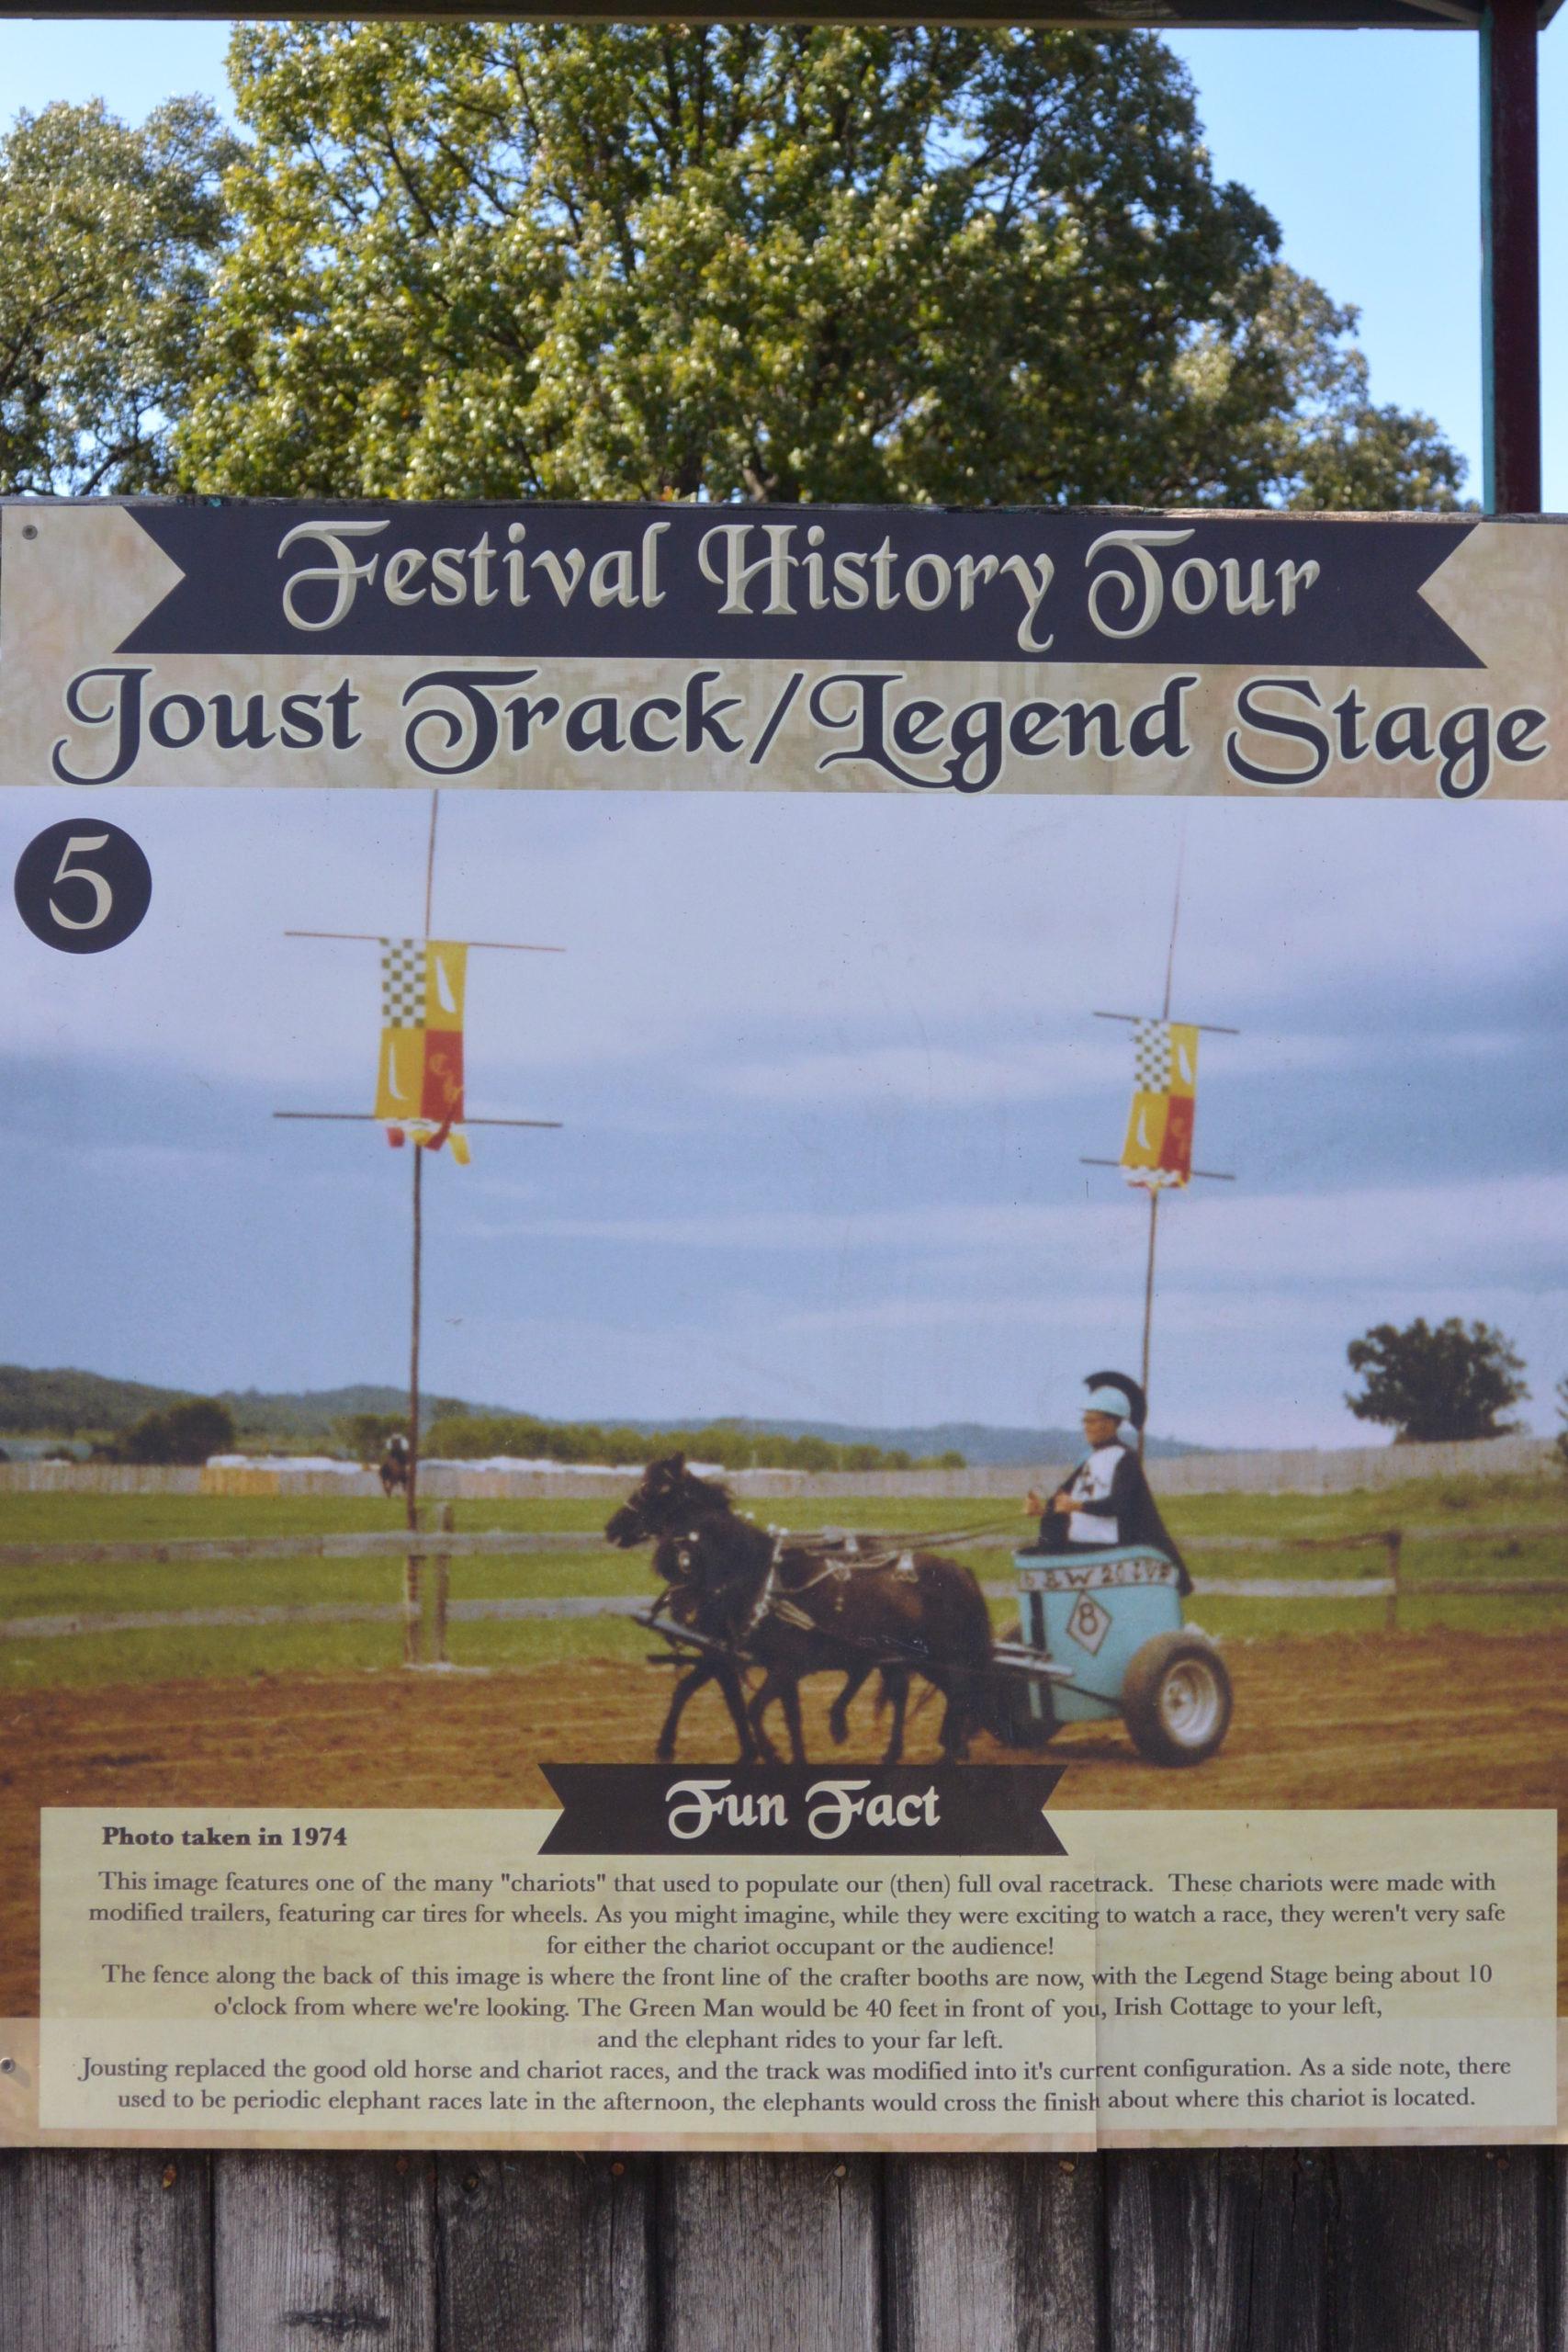 Festival History Tour - Track